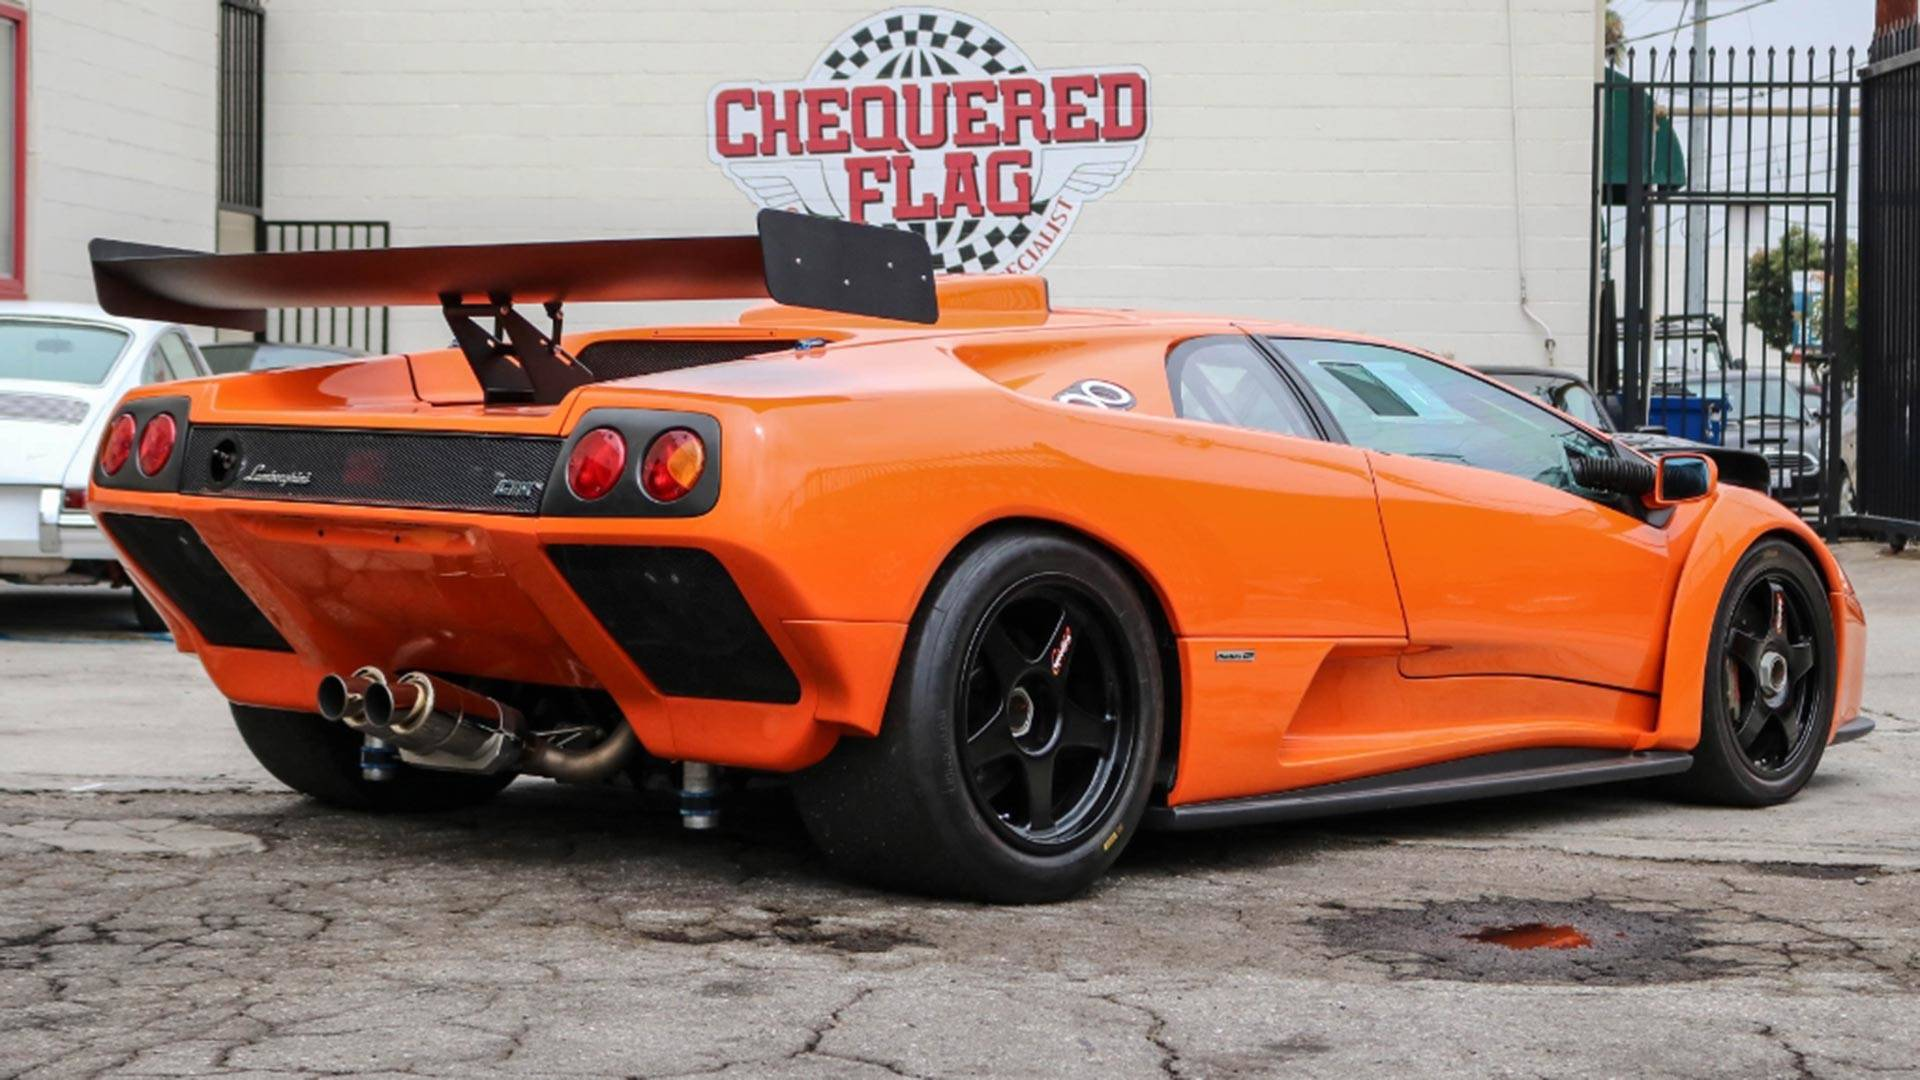 Lamborghini Diablo Gtr Will Make You A Track Day King For 645k